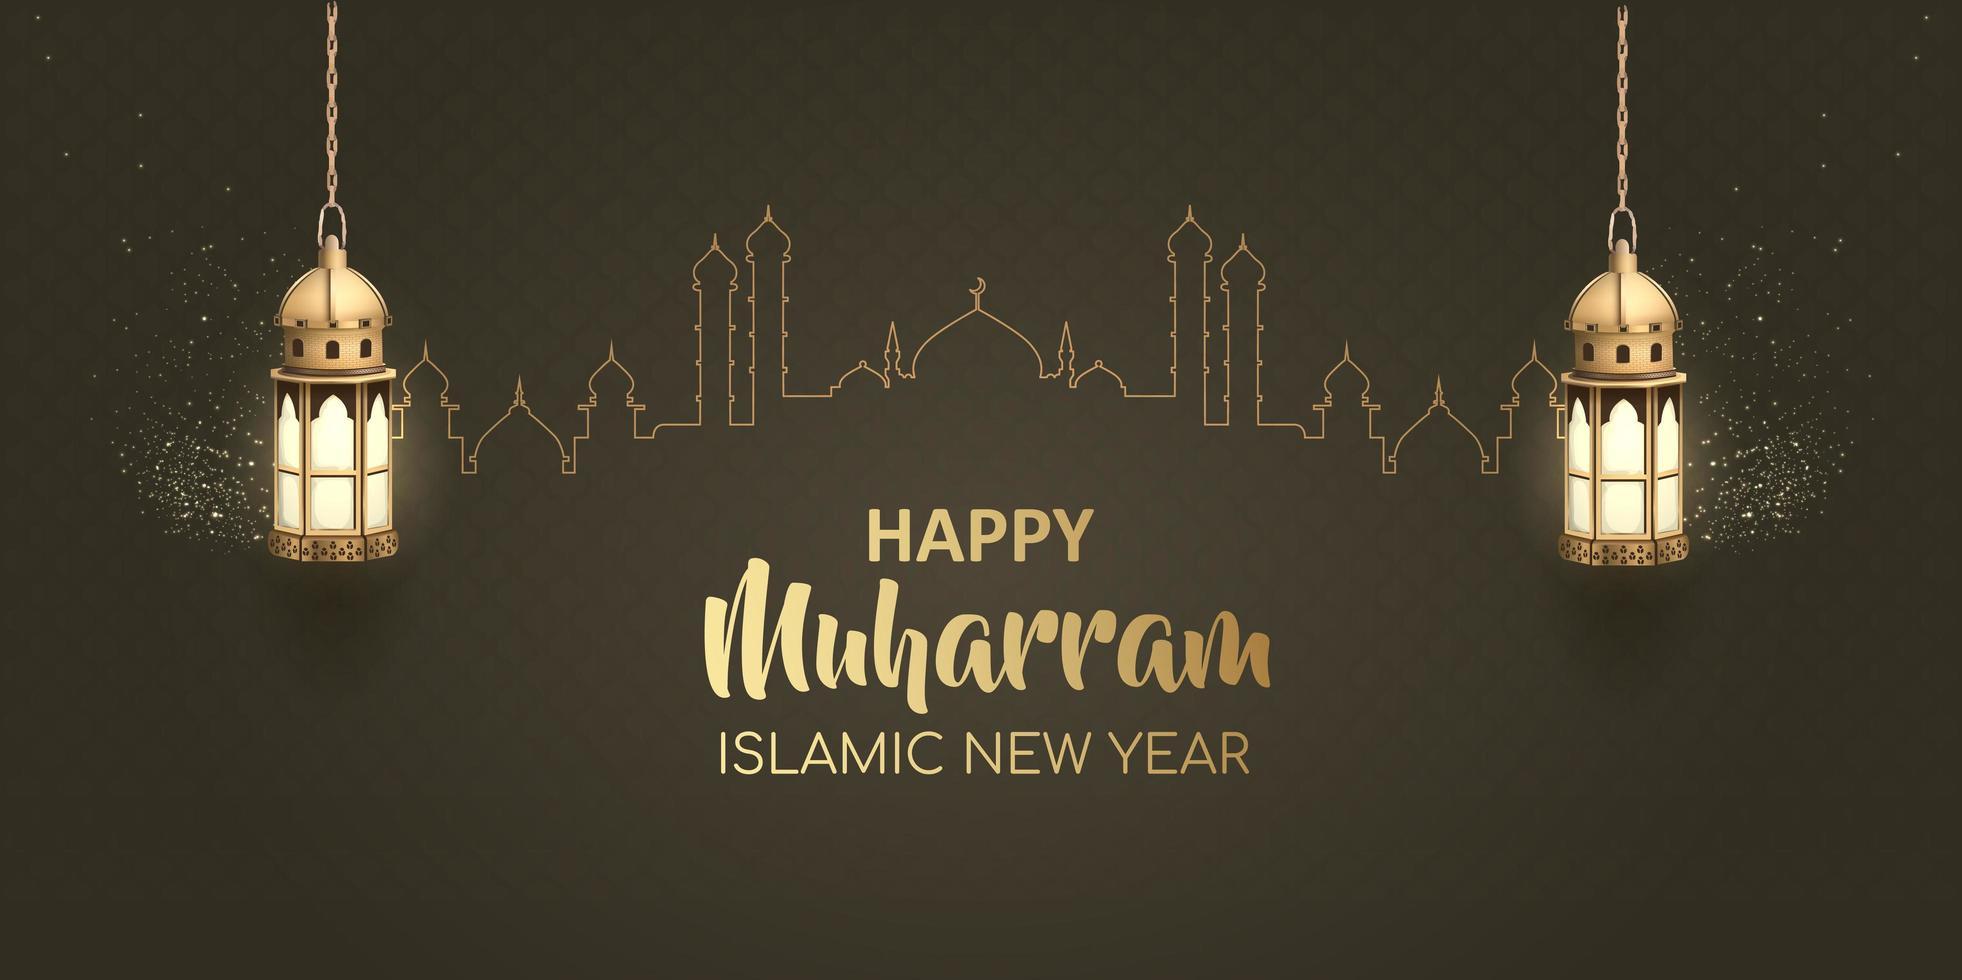 Happy Muharram Islamic New Year Design  vector